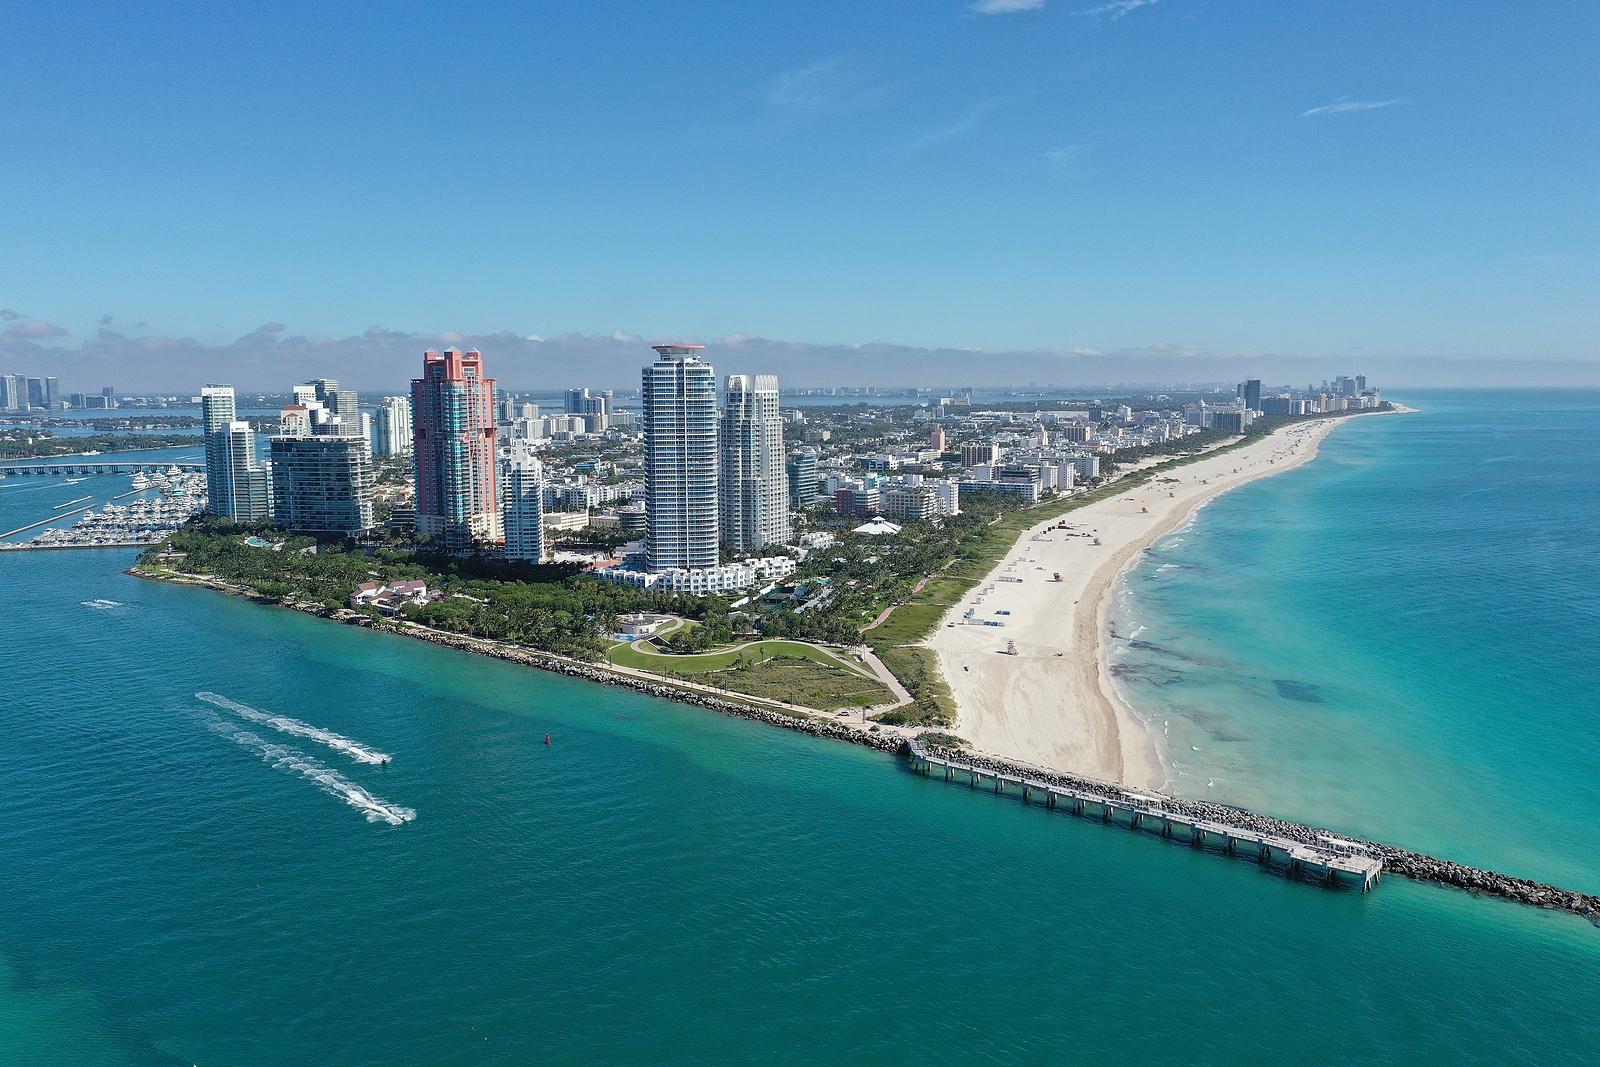 Art Shuttle New York – Florida Will Leave on August 24